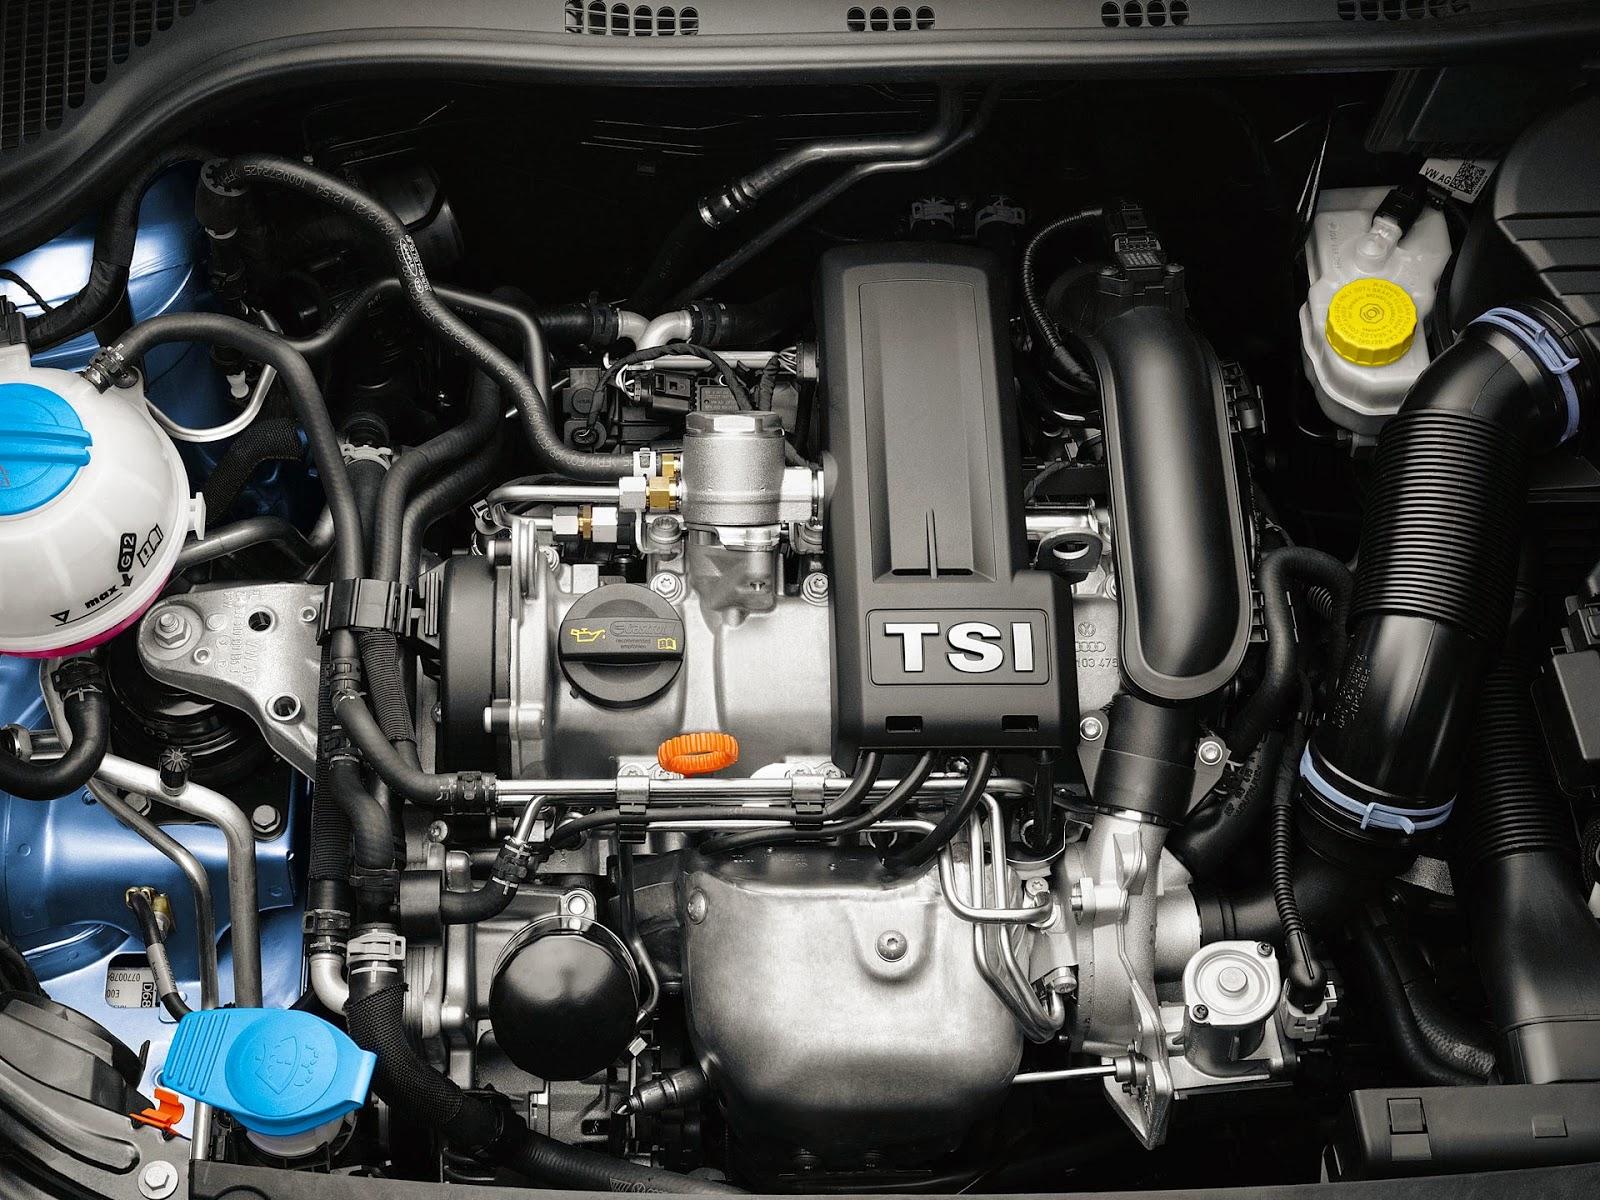 Характеристика двигателя шкода октавия 3 14 фотография